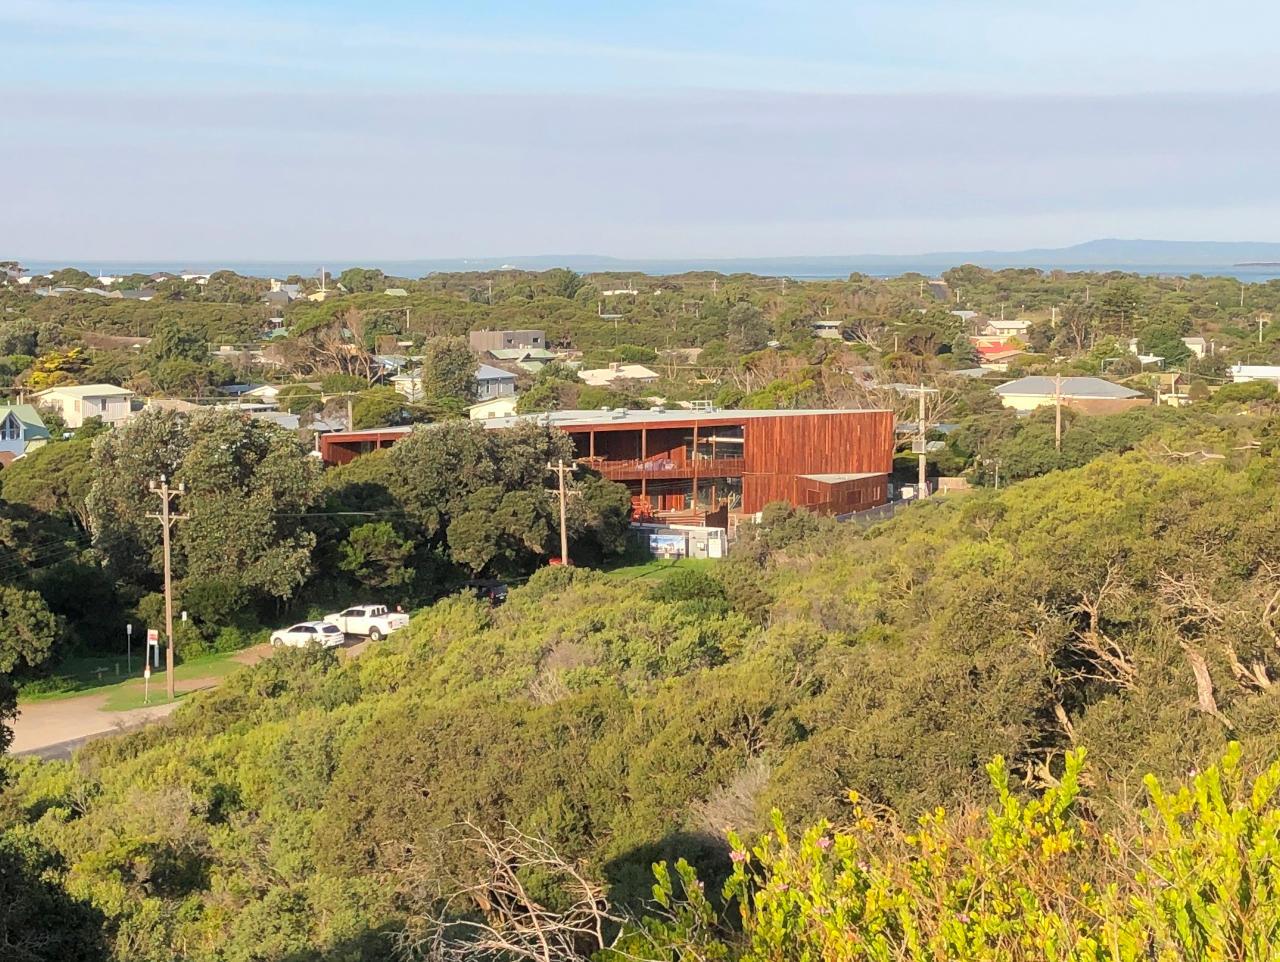 View of PLSLSC in surrounding landscape